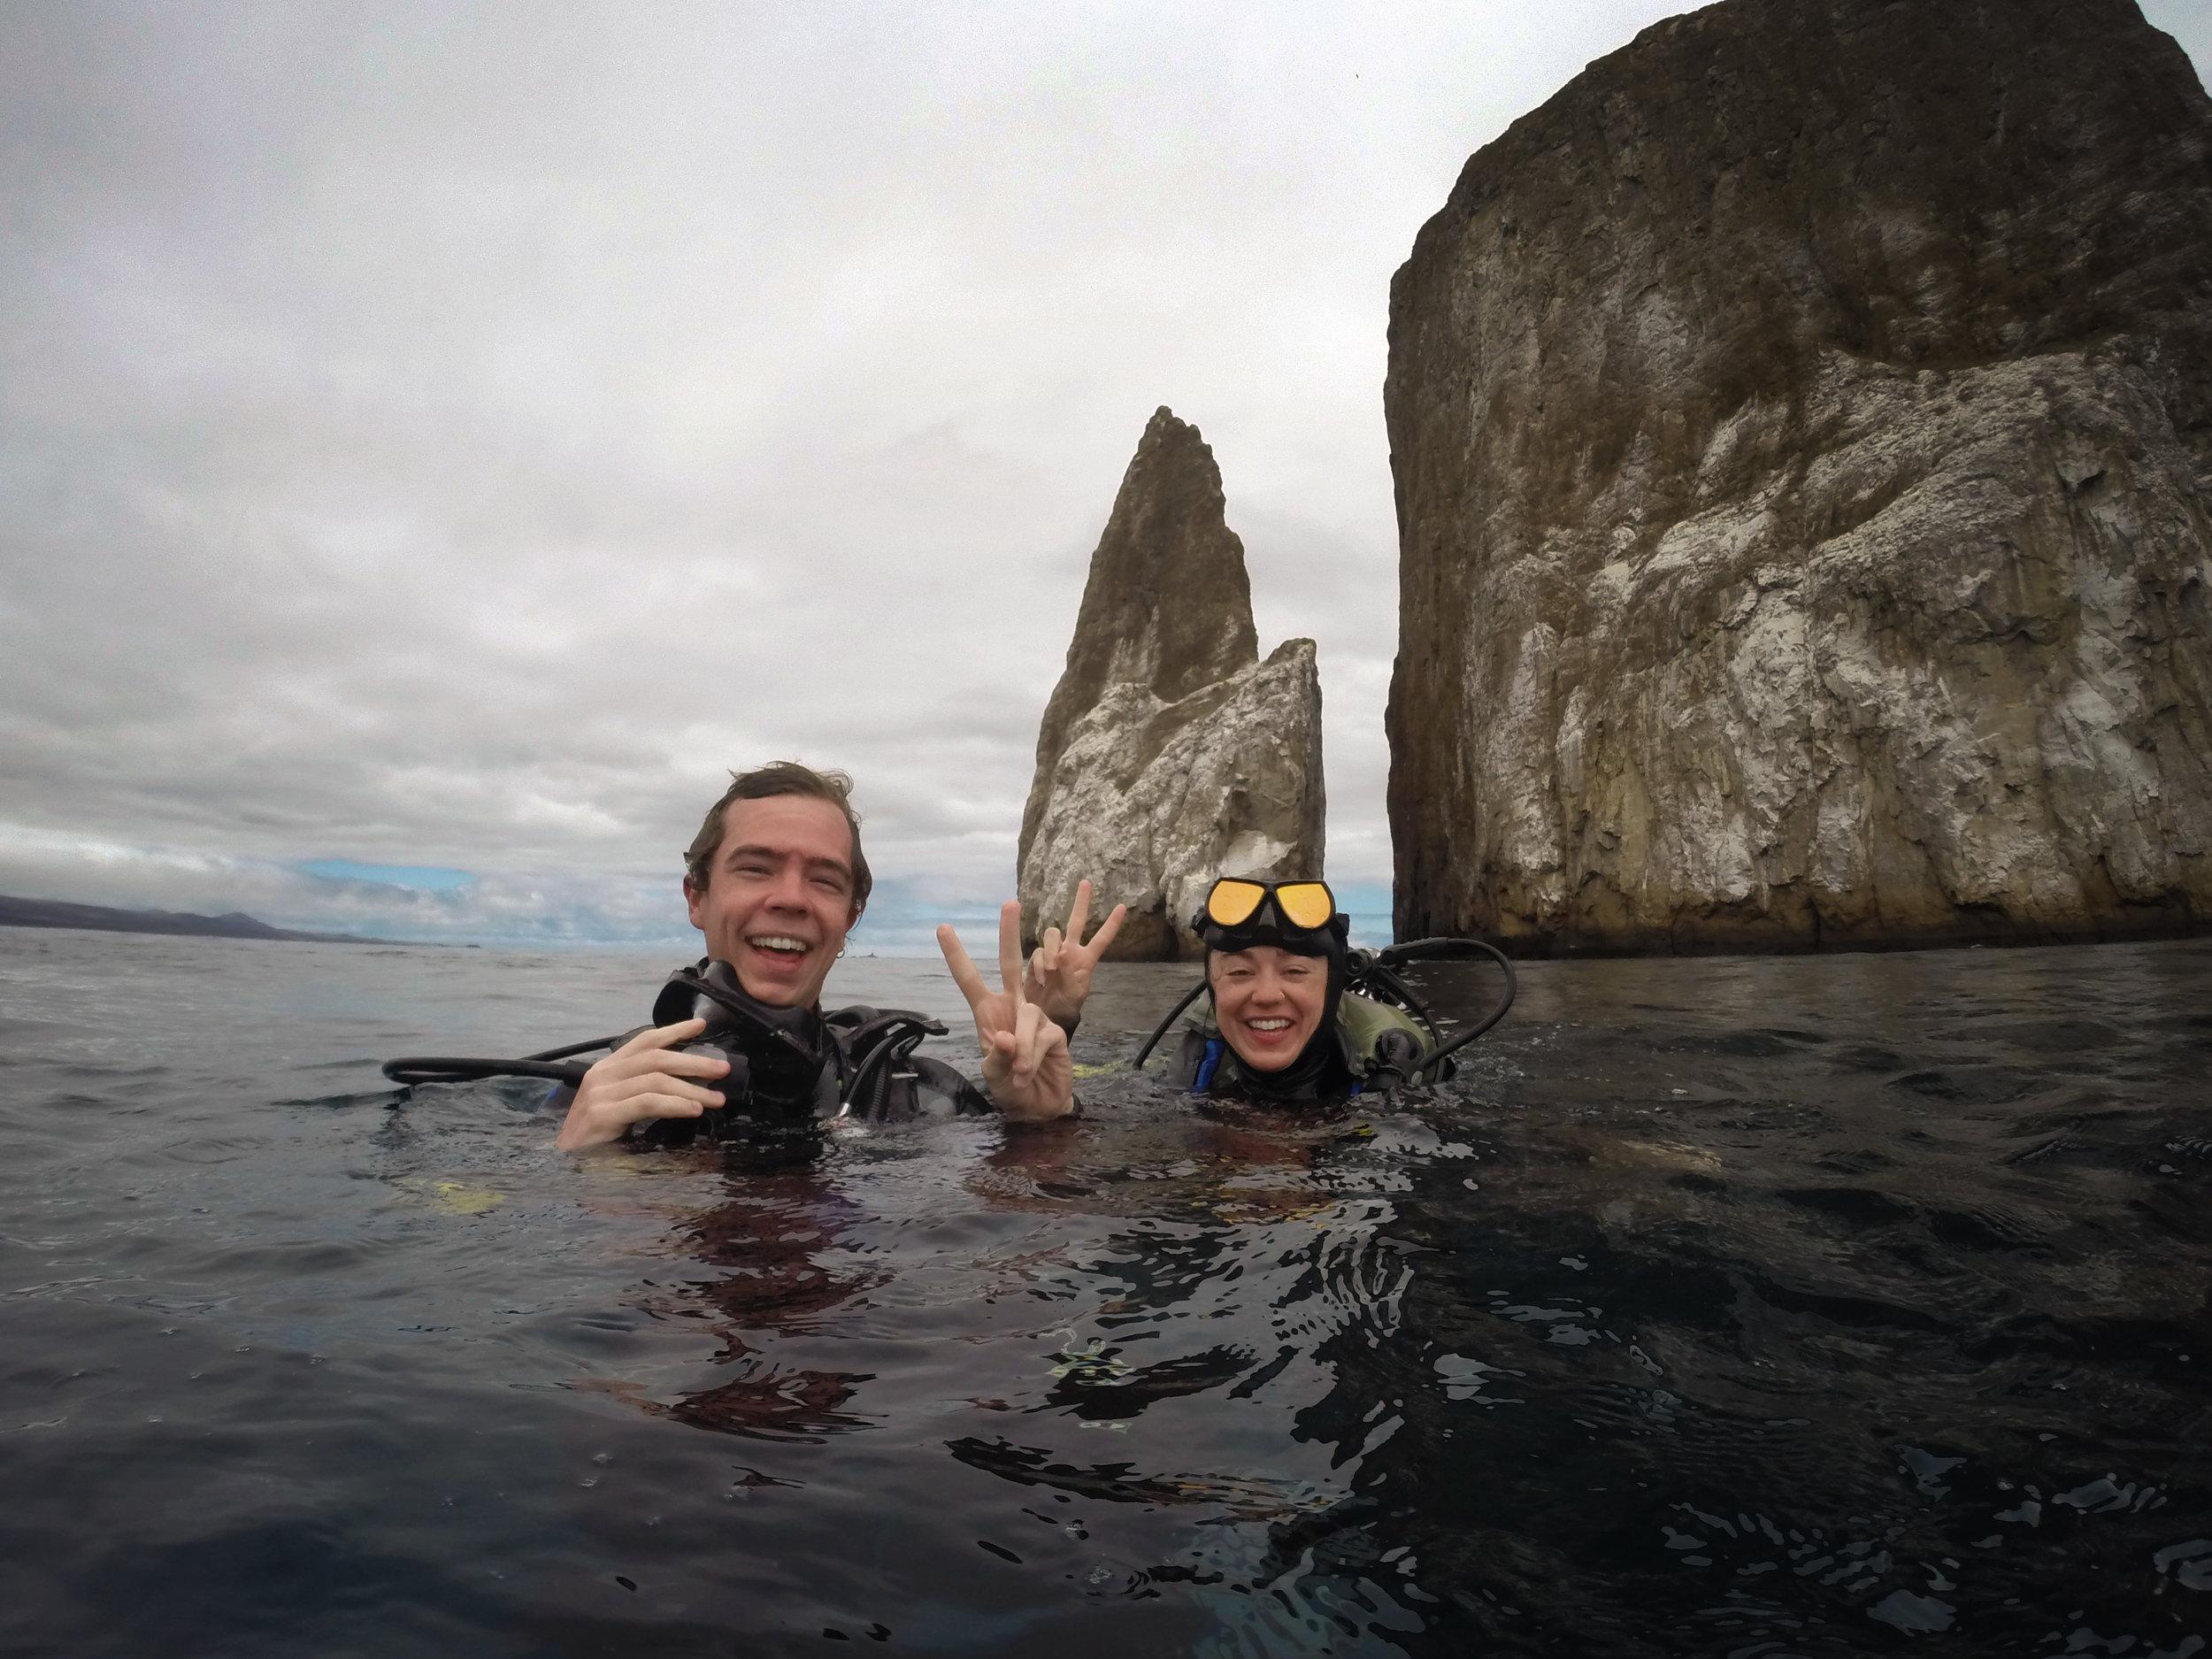 The end of a wonderful dive off Kicker Rock on San Cristóbal Island